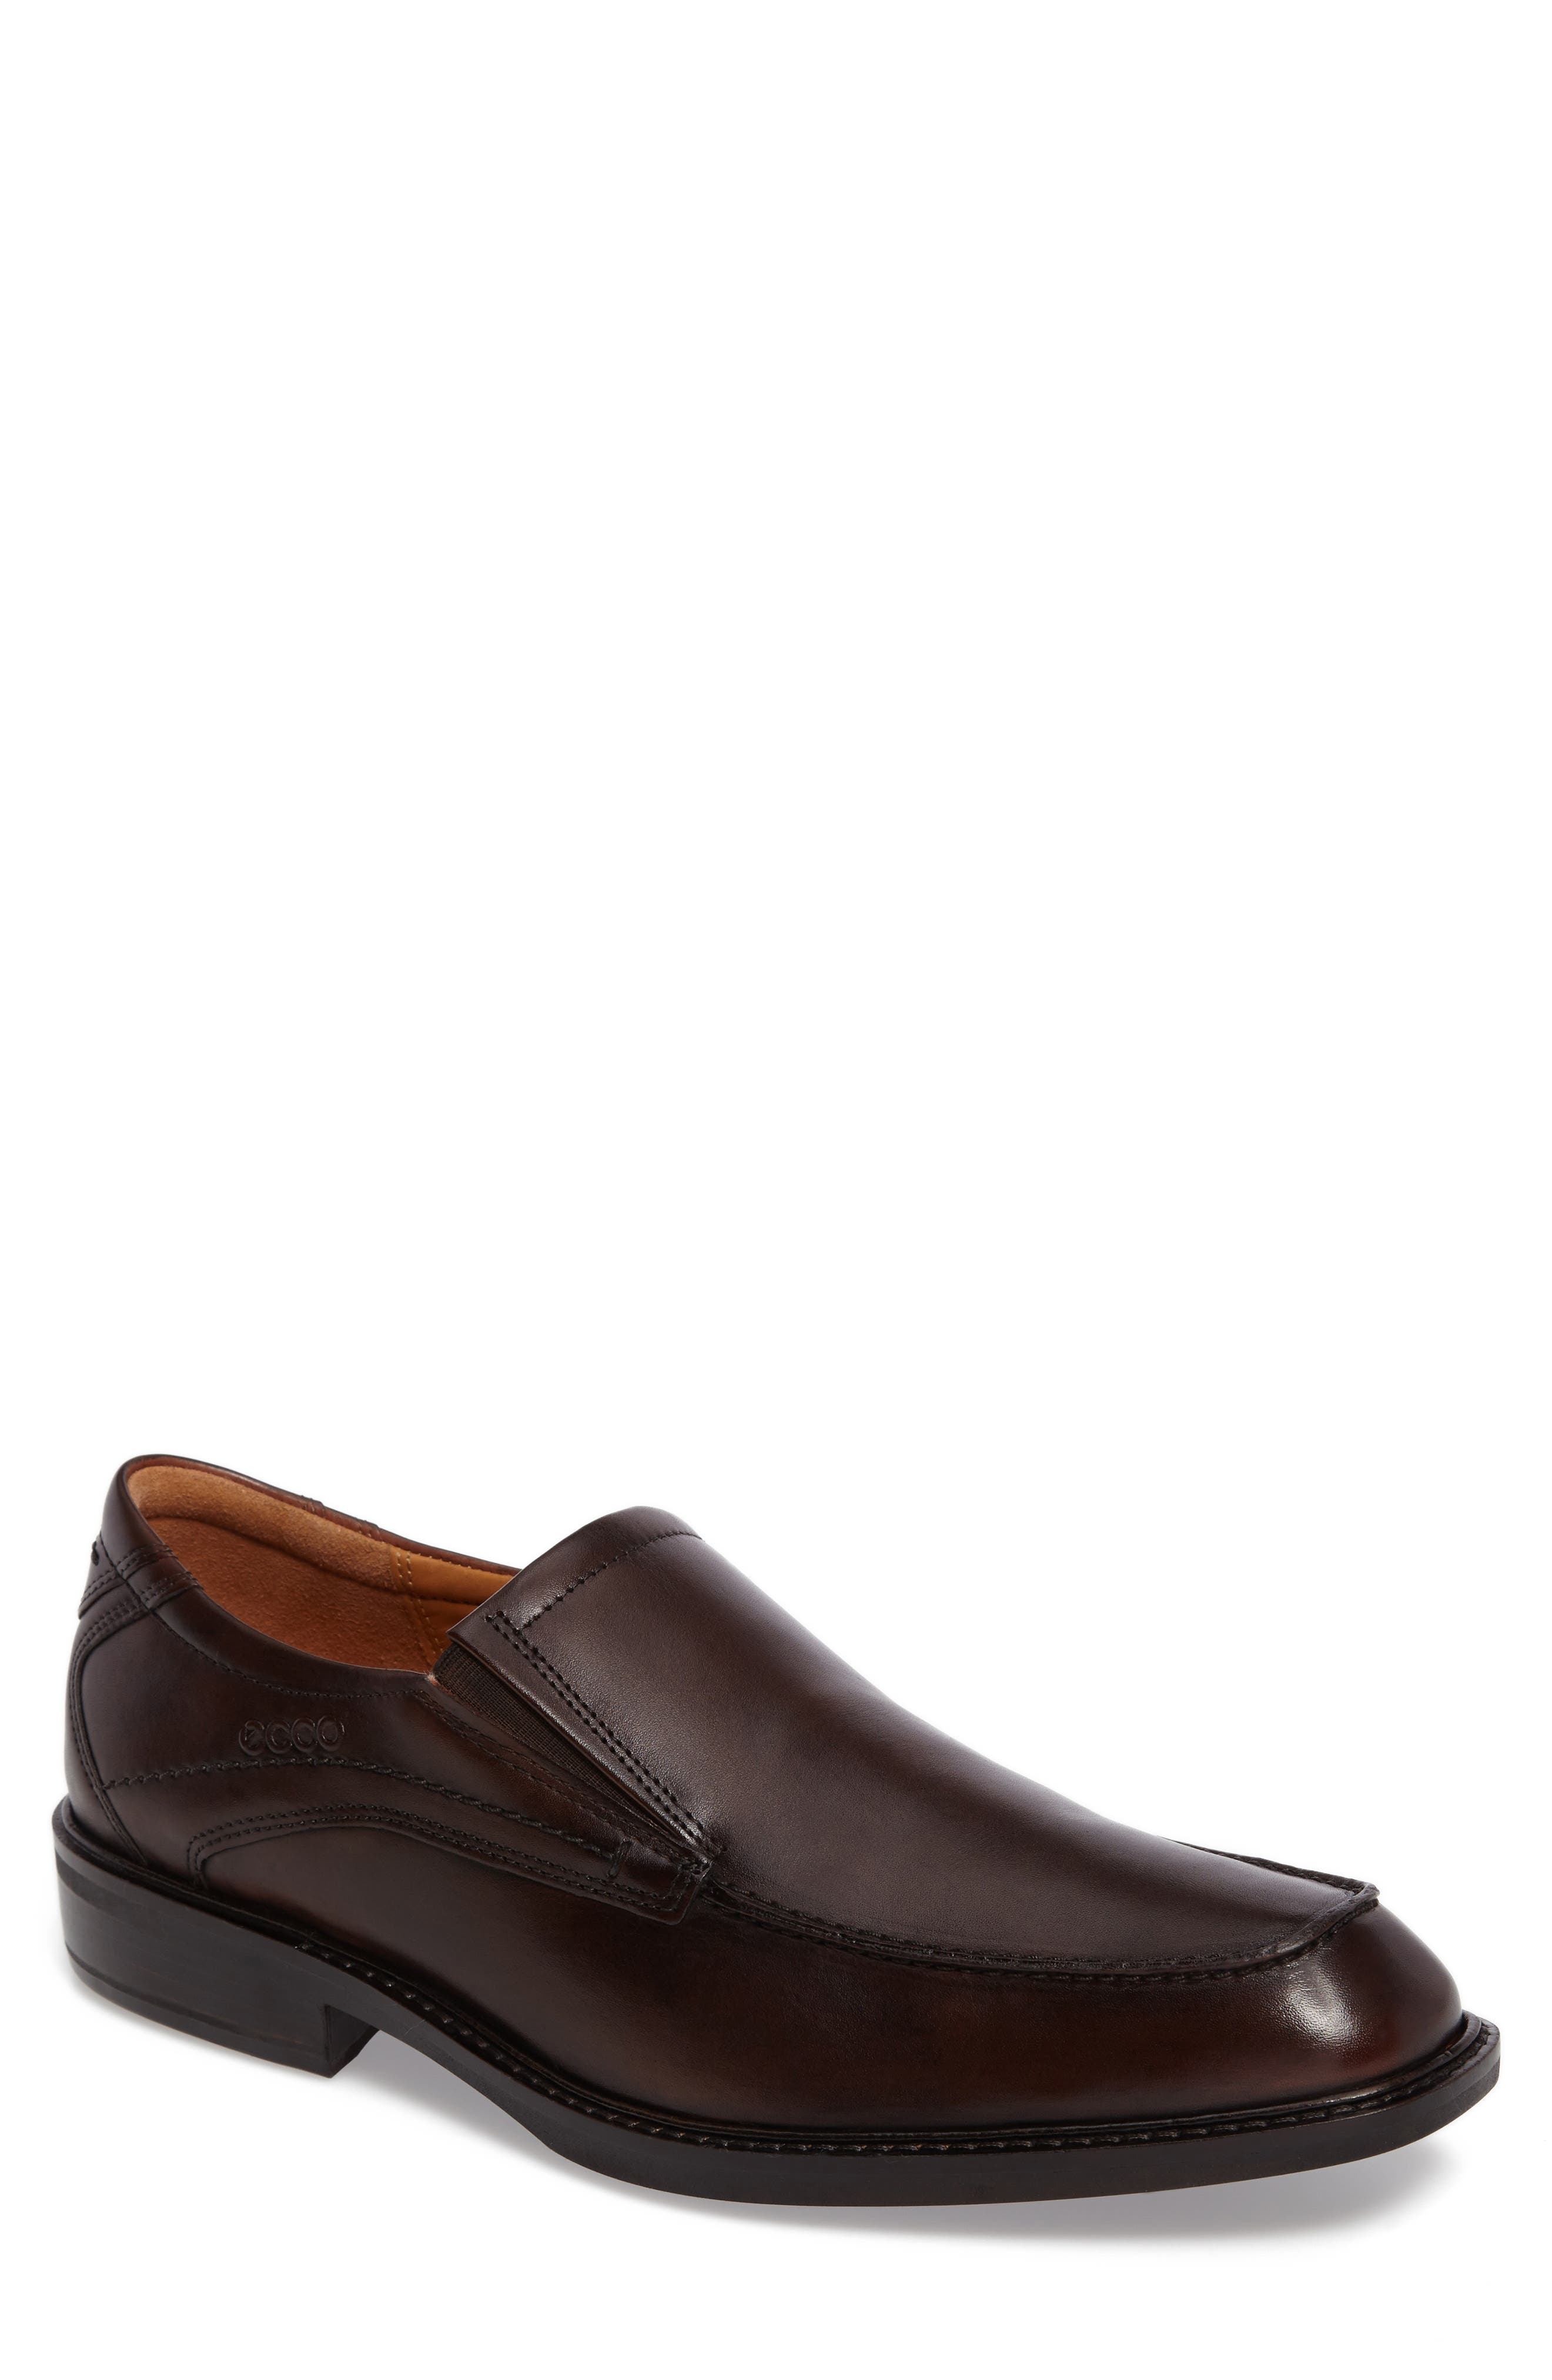 Alternate Image 1 Selected - ECCO 'Windsor' Slip-On (Men)